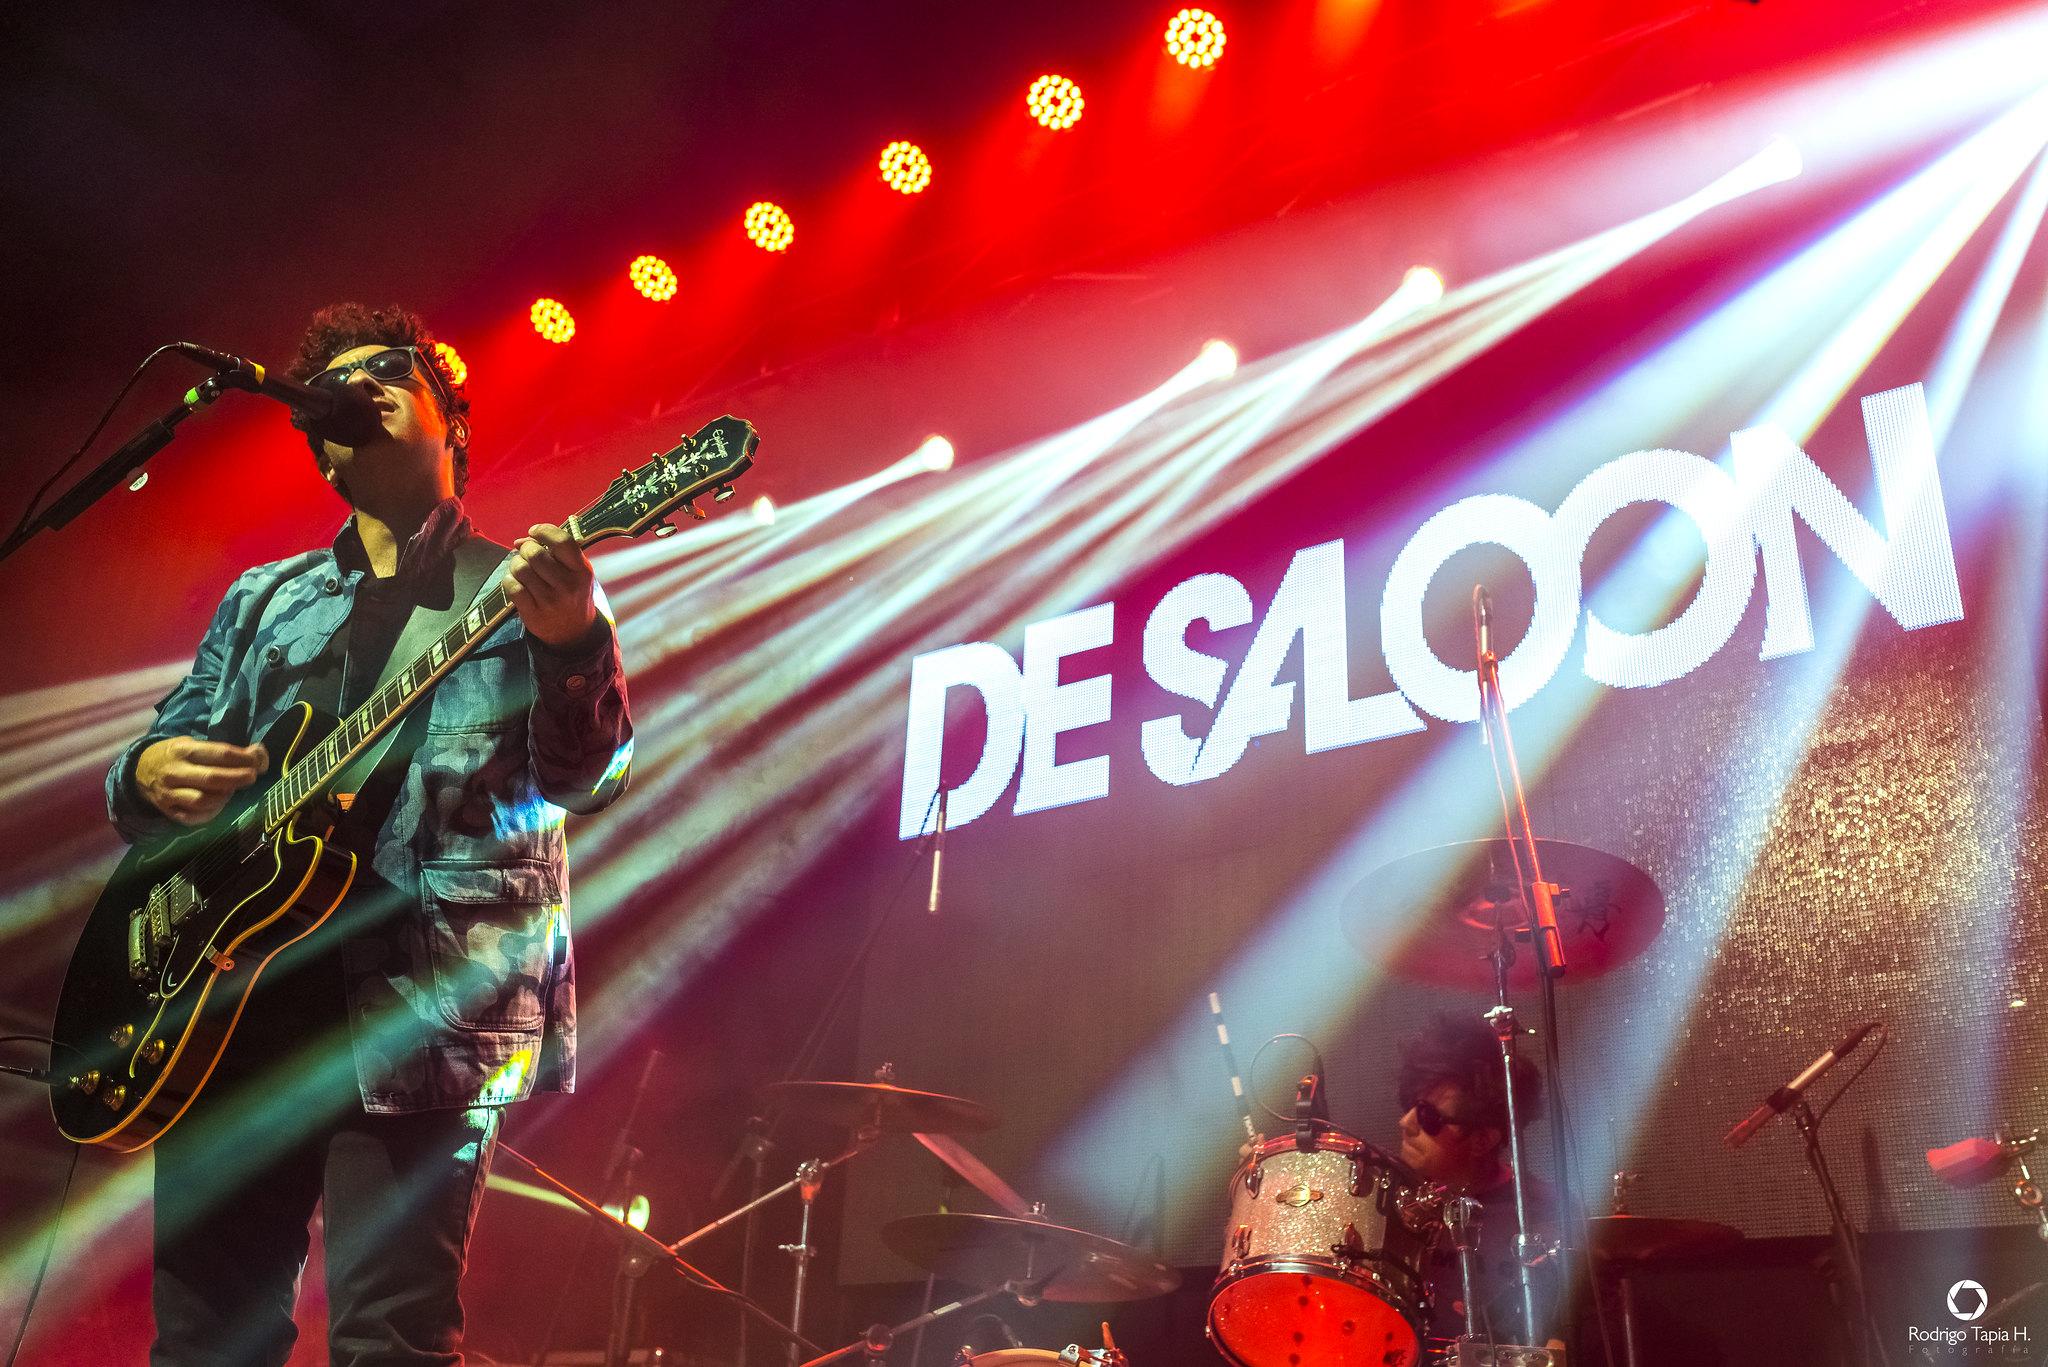 DeSaloon